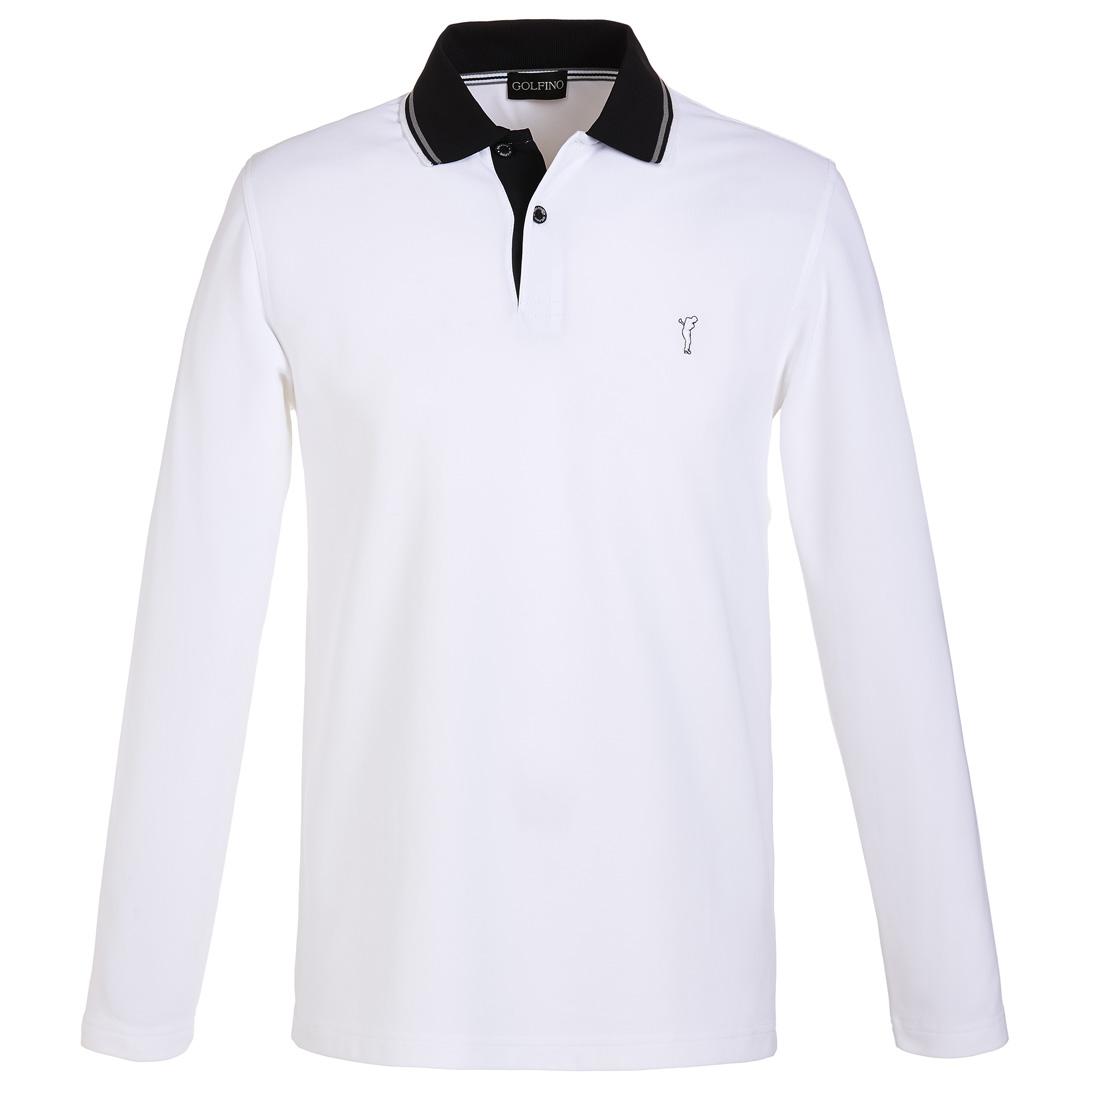 Premium Herren Funktions-Golfpolohemd Sun Protection